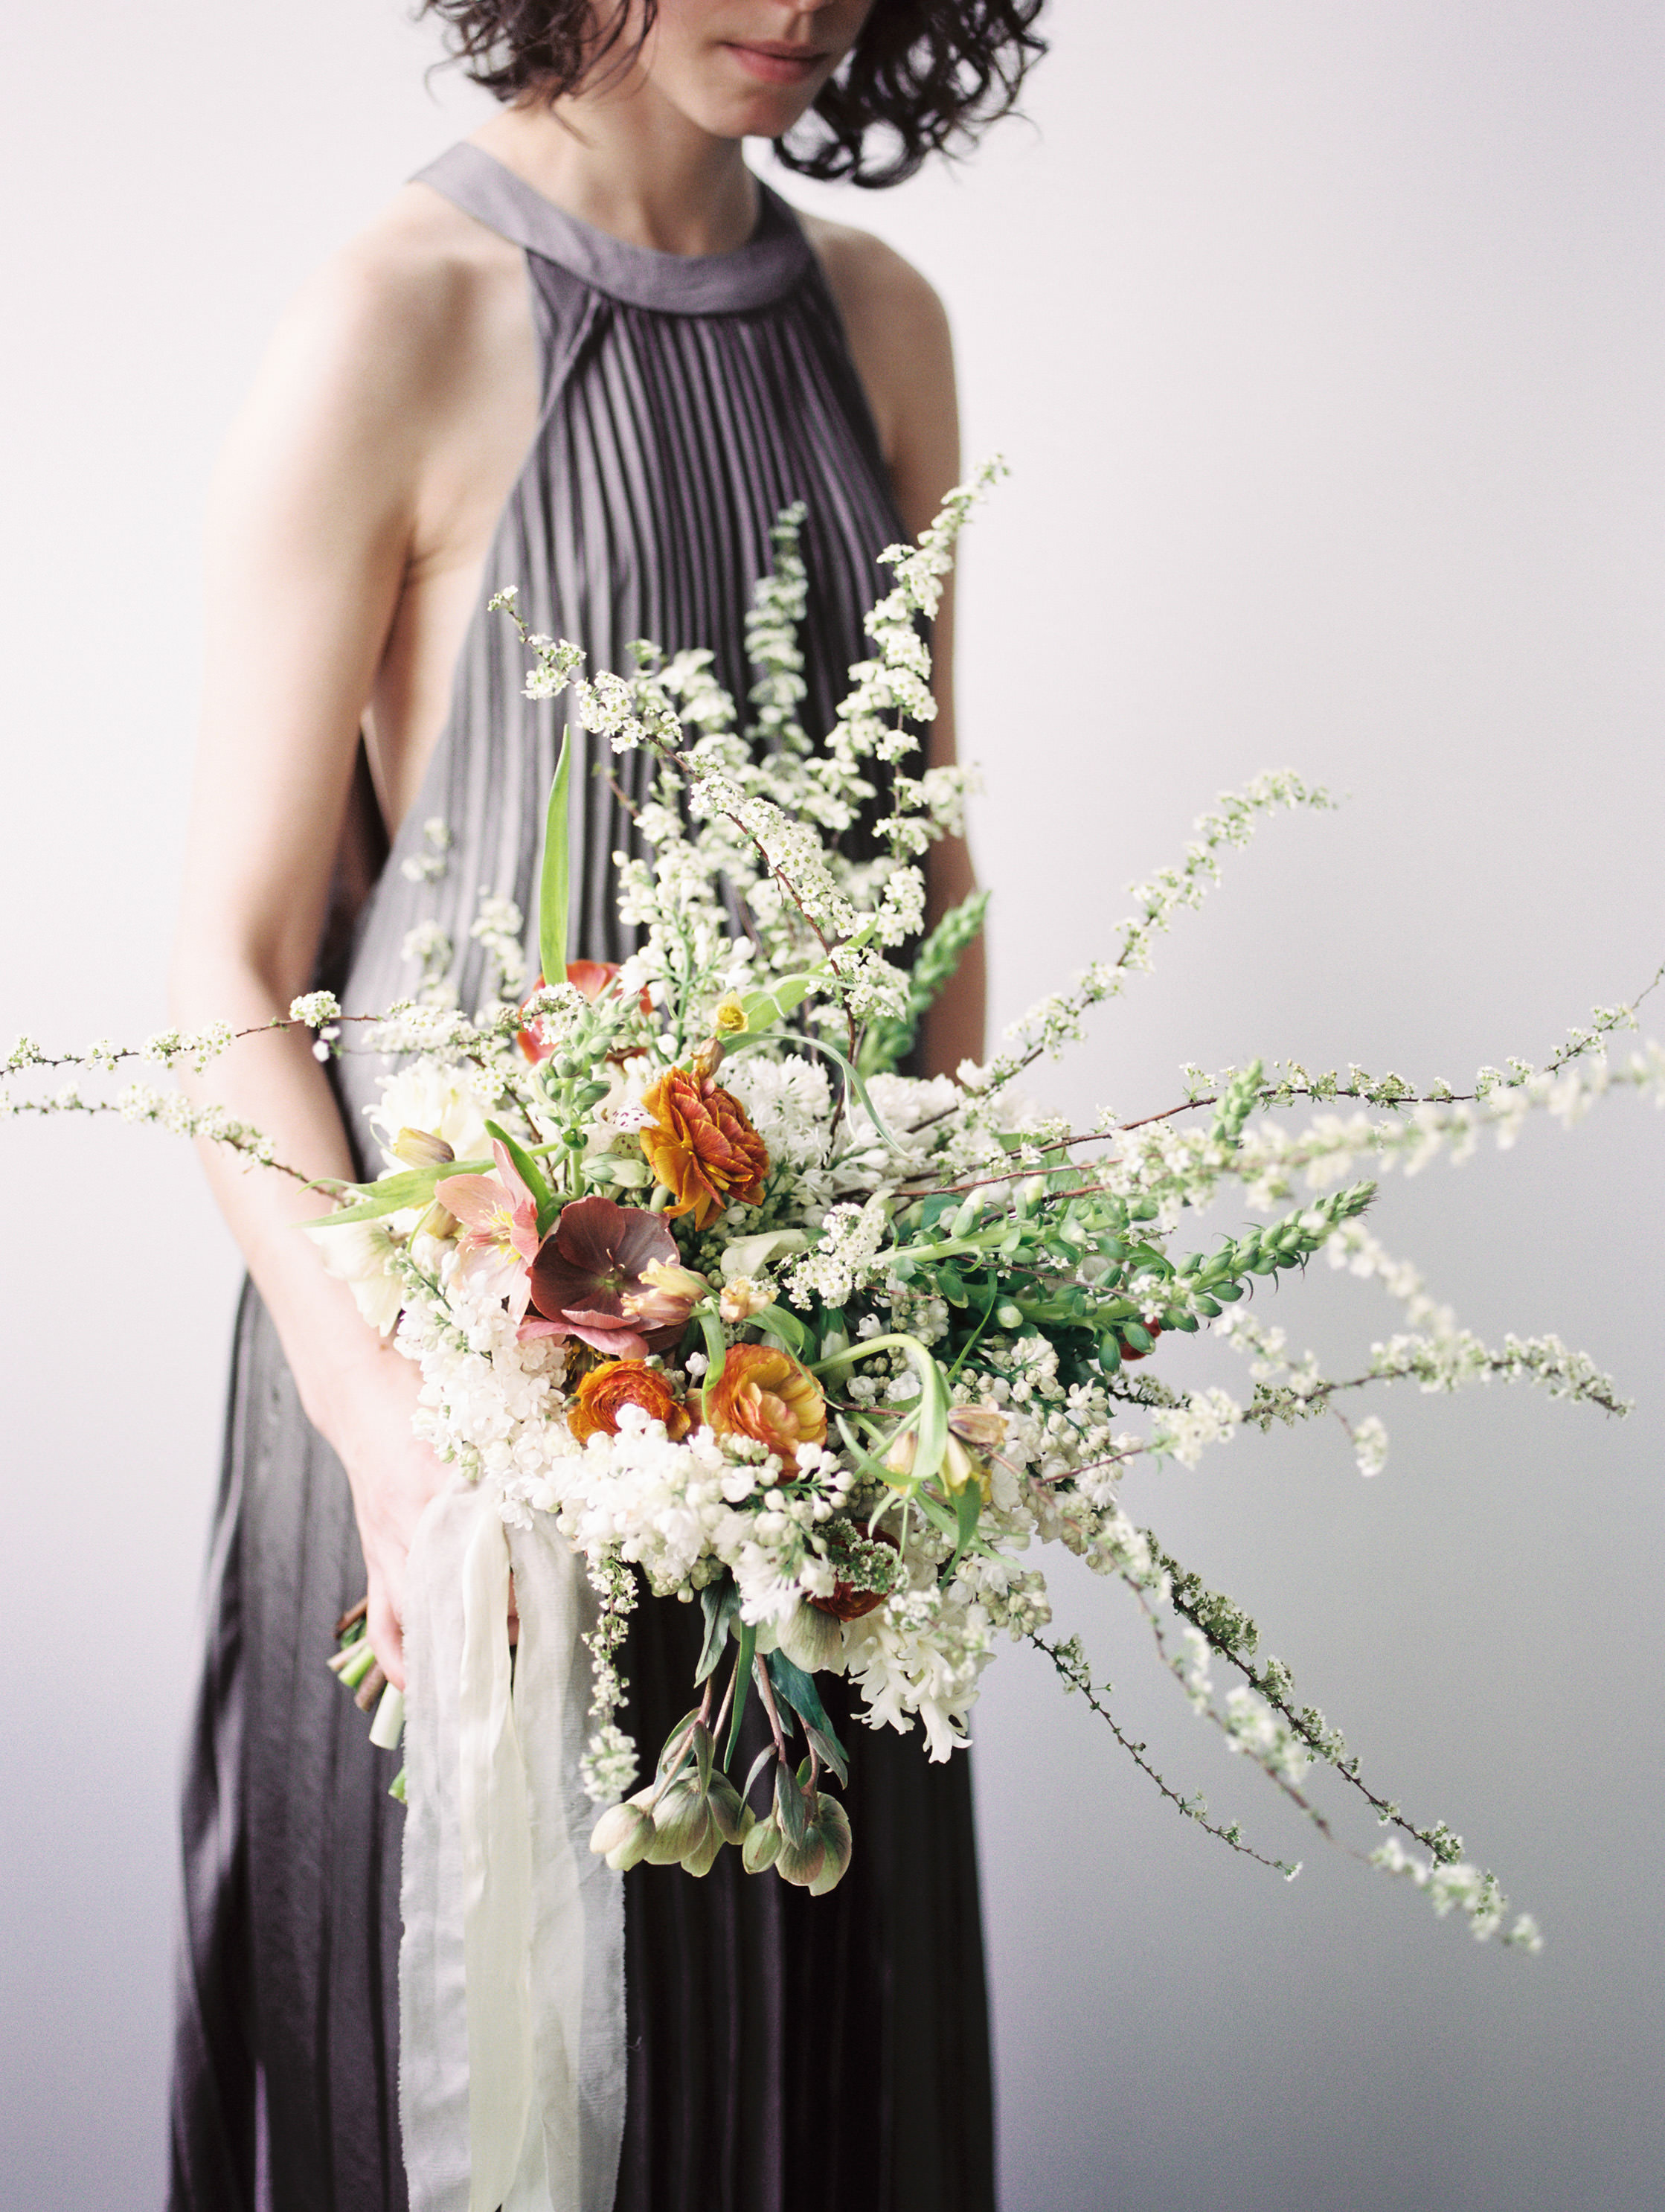 My bouquet by Kate Osborne